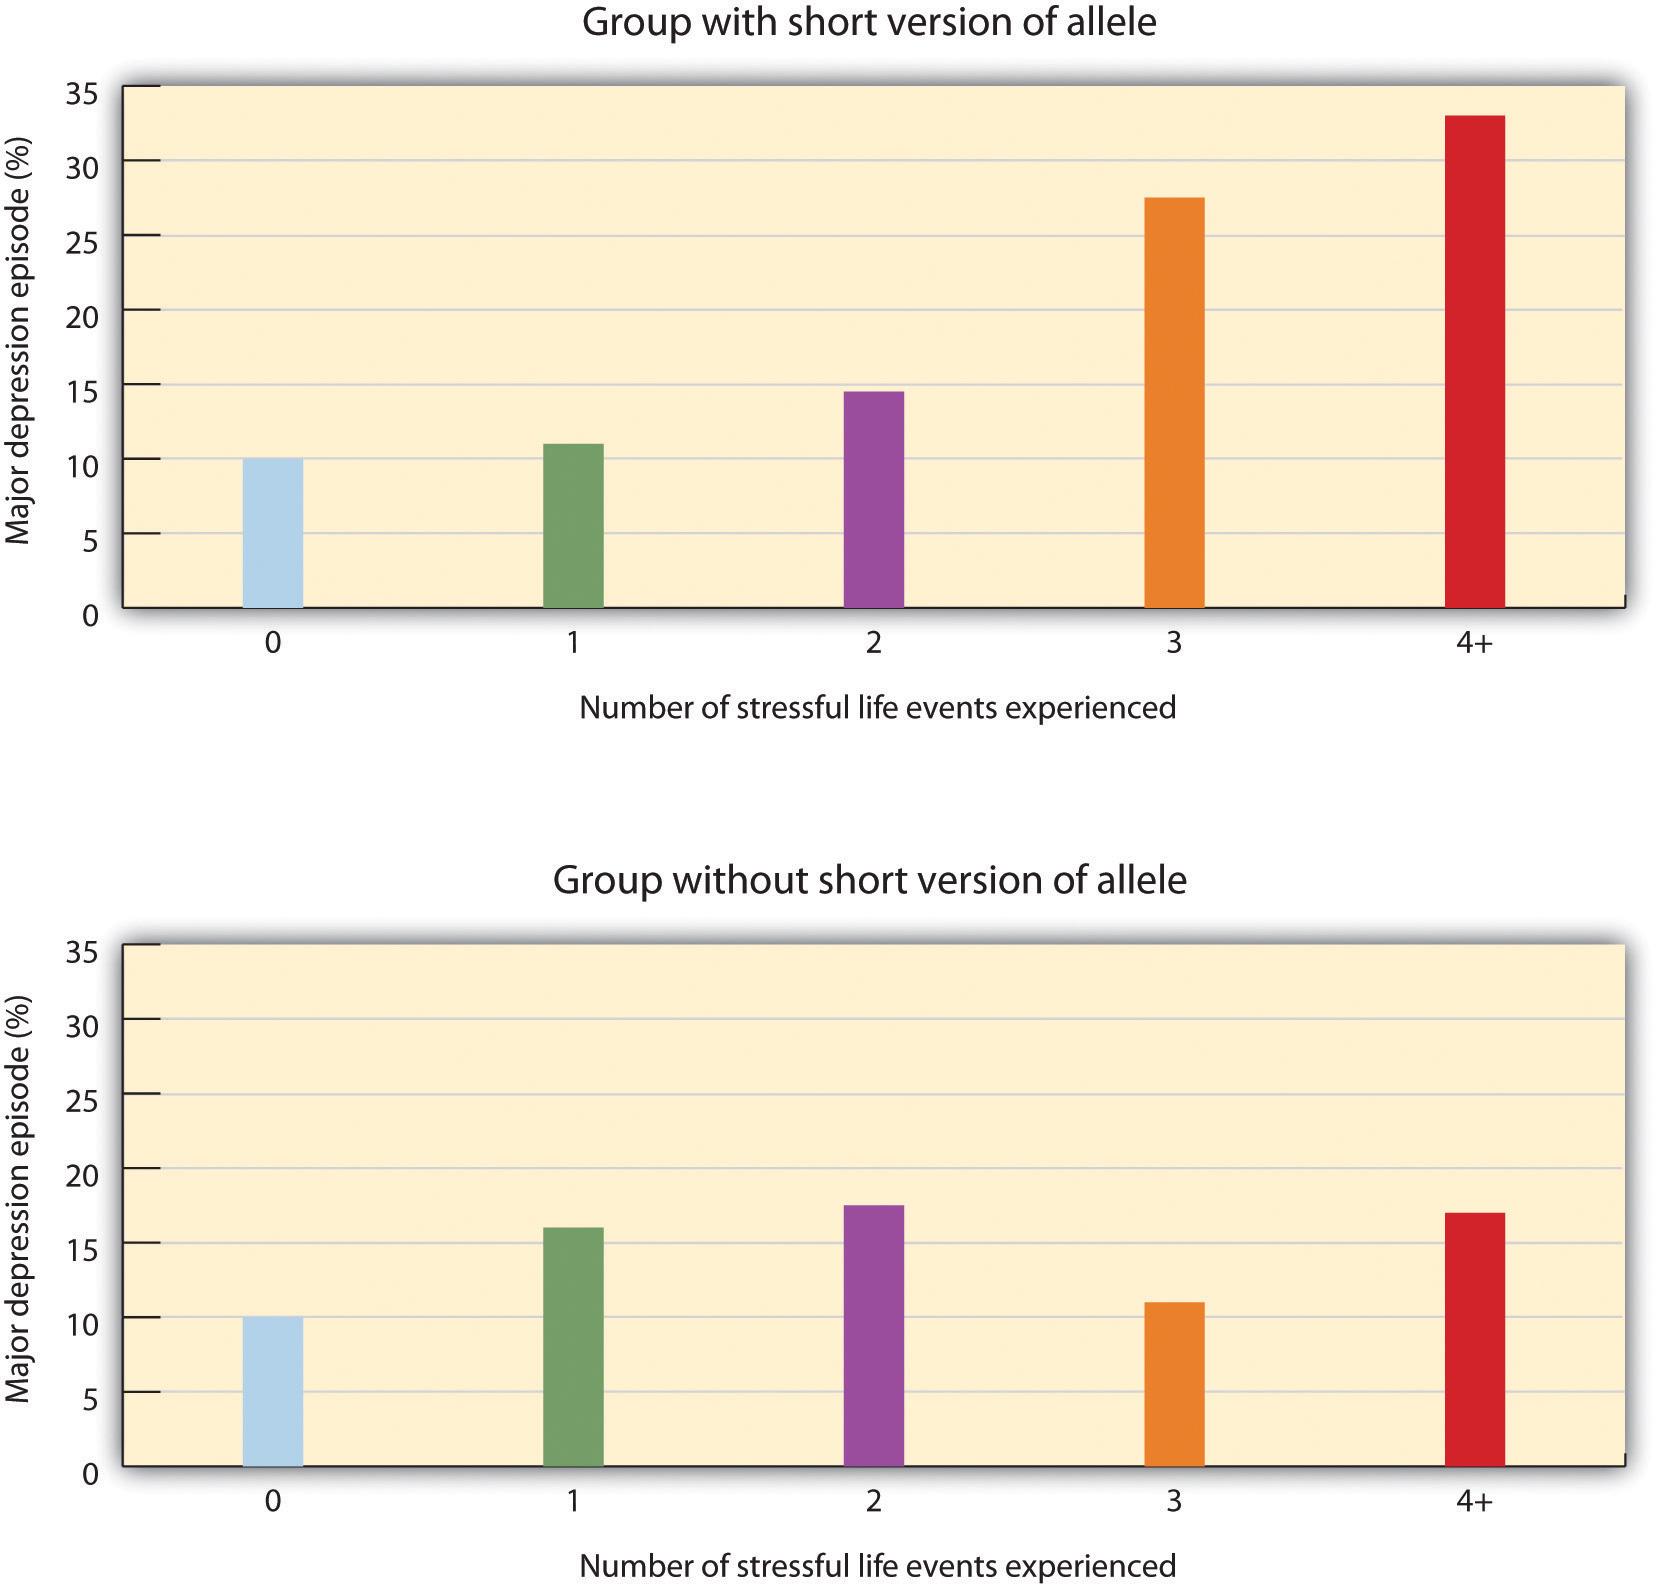 Dancers And Eating Disorders Statistics Dbafcaecabccaca